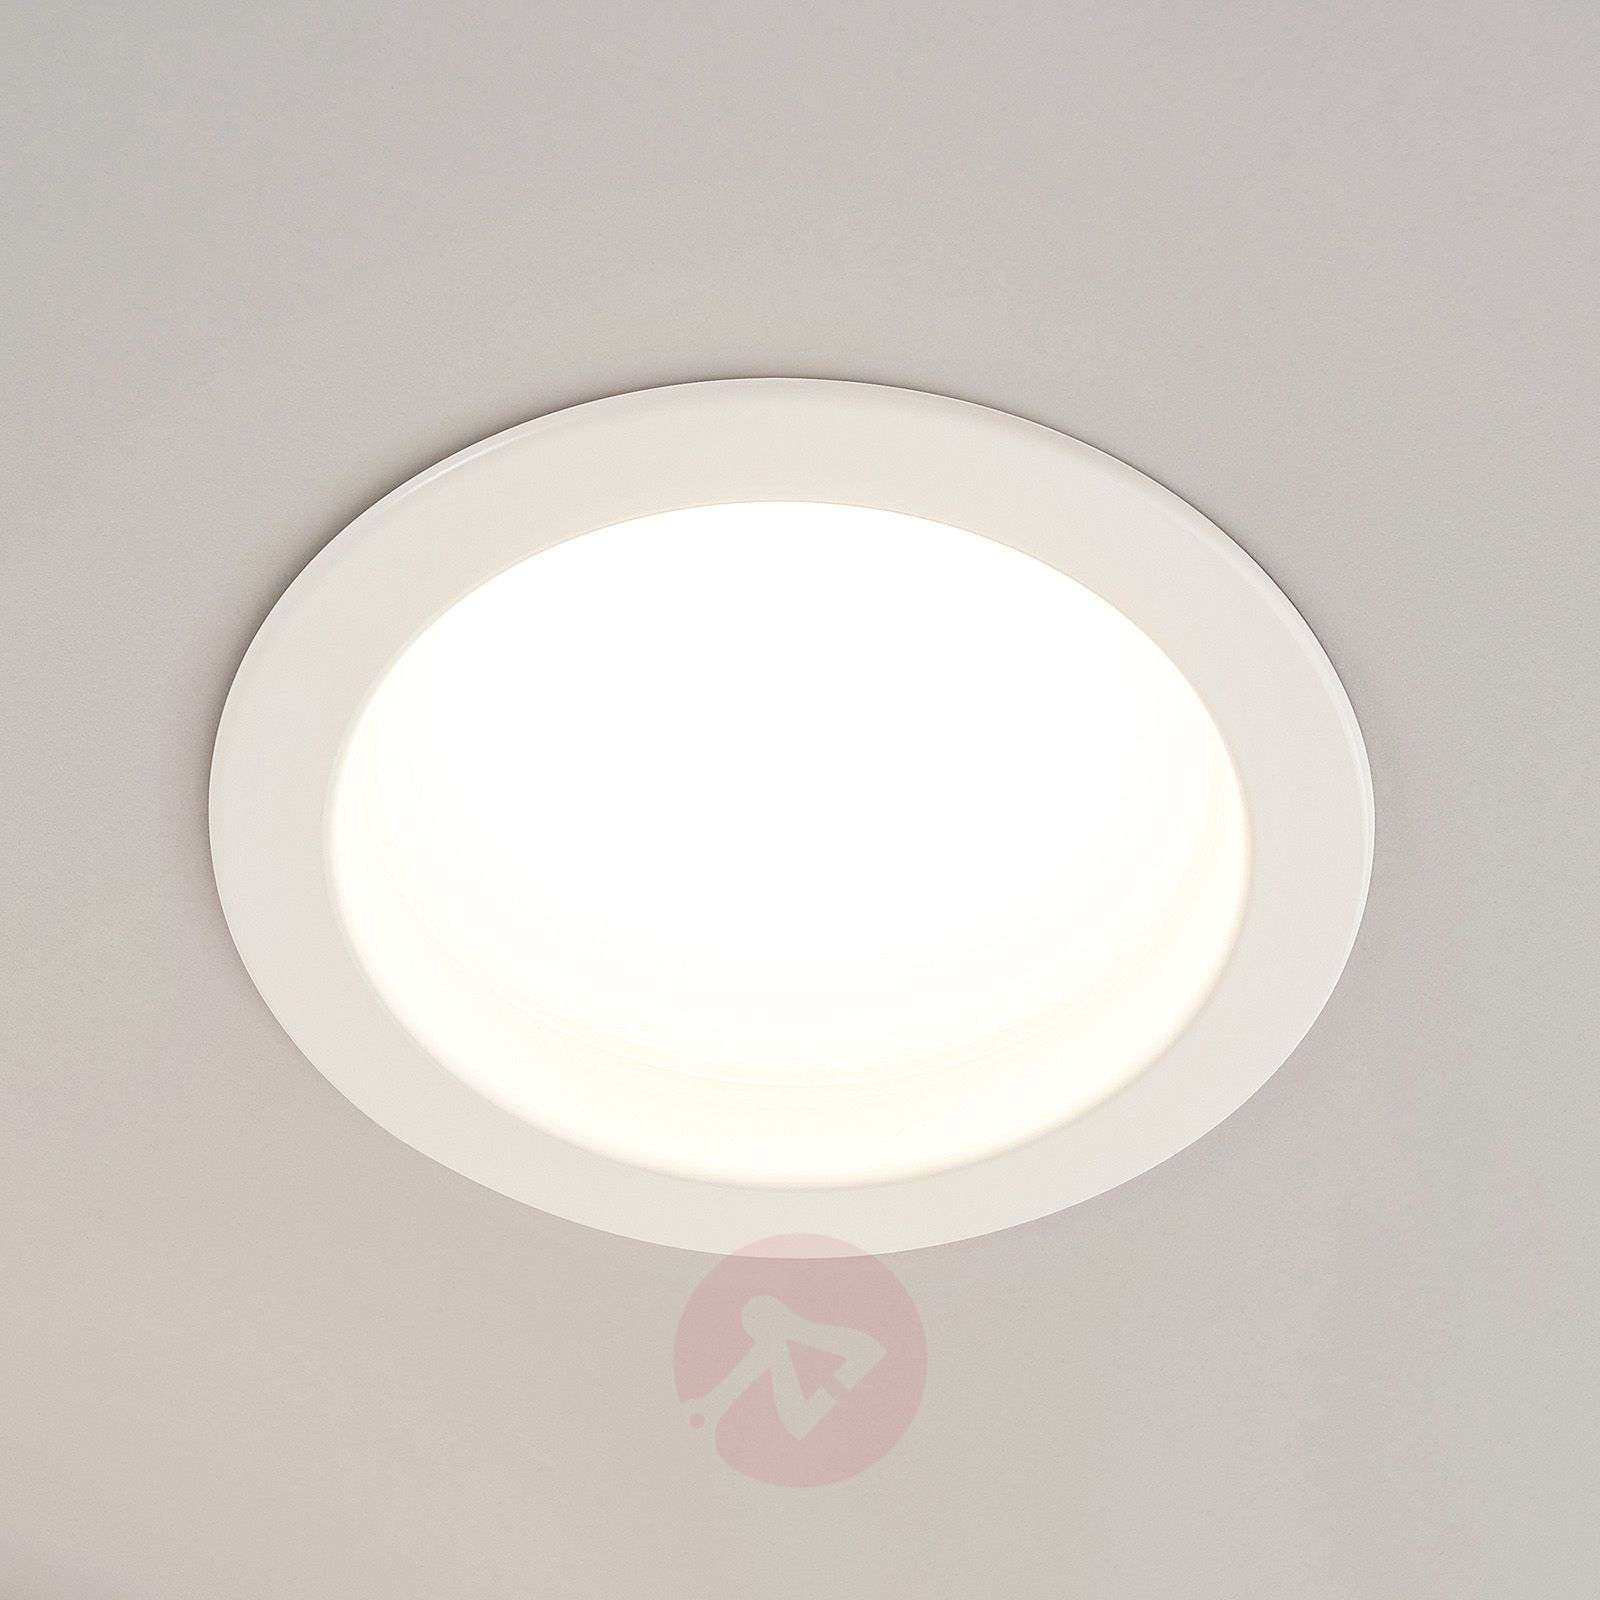 Piet LED-lamppu 17,5W, 3 valinnaista valonväriä-9978035-07